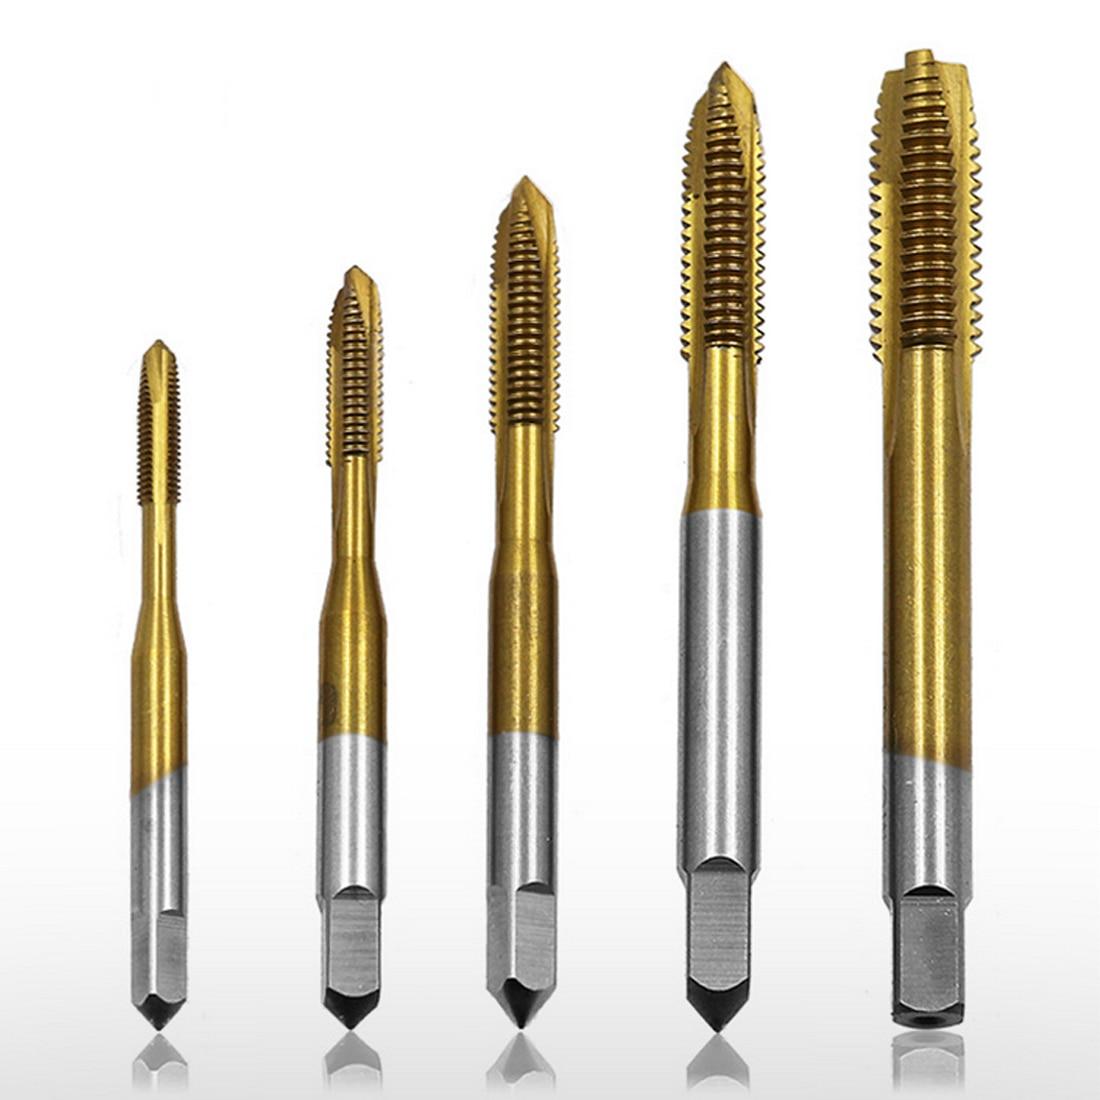 1pcs/5pcs Titanium Coated Thread Tap Drill Metric Hss Spiral Fluted Machine Screw Tap Spiral Pointed Taps M3 M4 M5 M6 M8